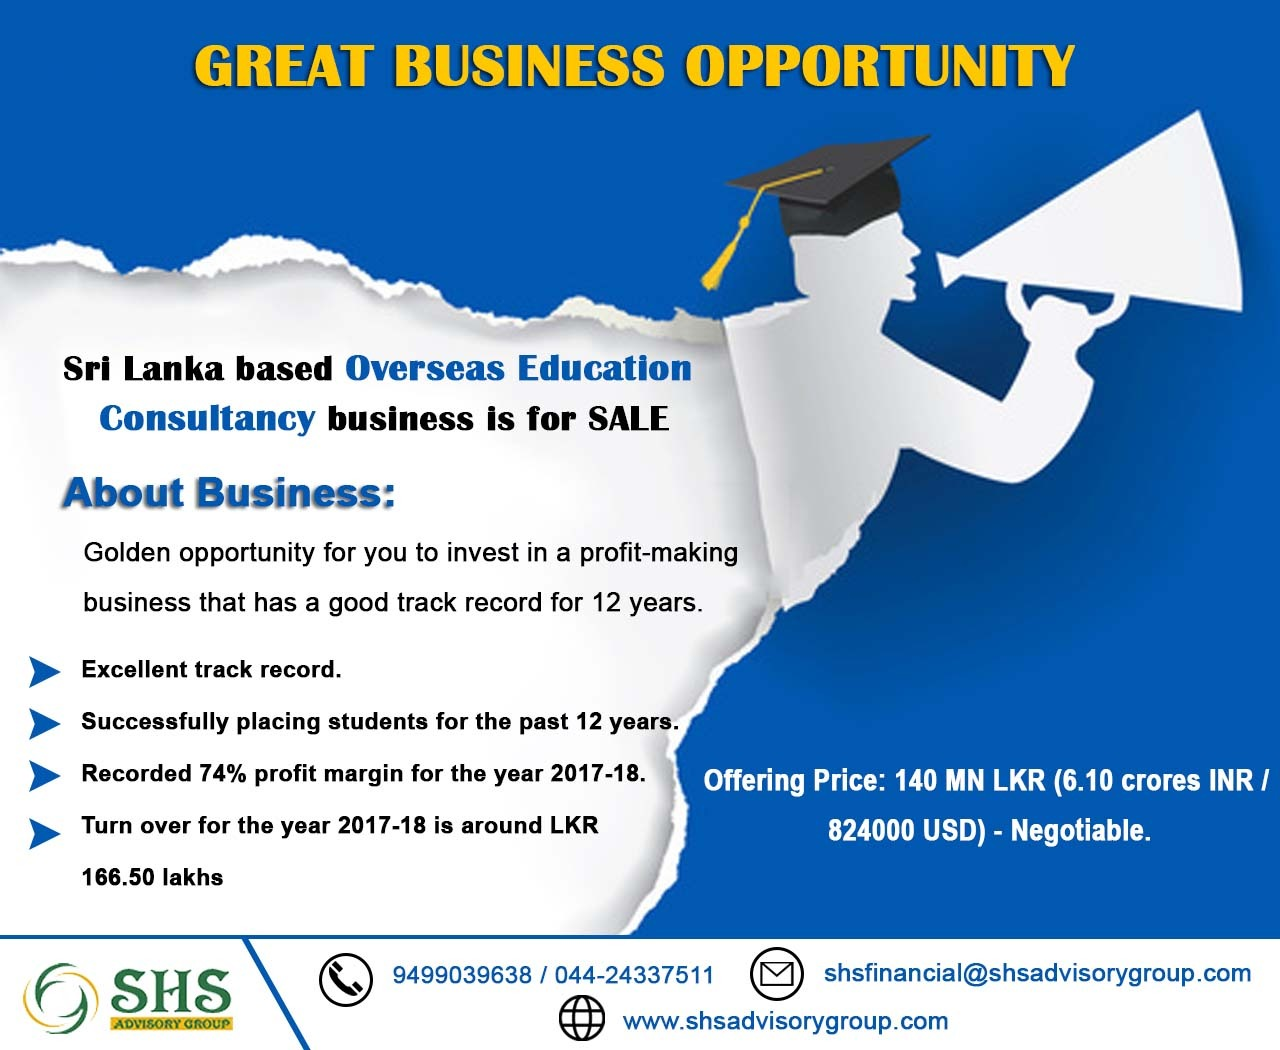 Overseas Education Srilanka 1 4 Mn Usd 5